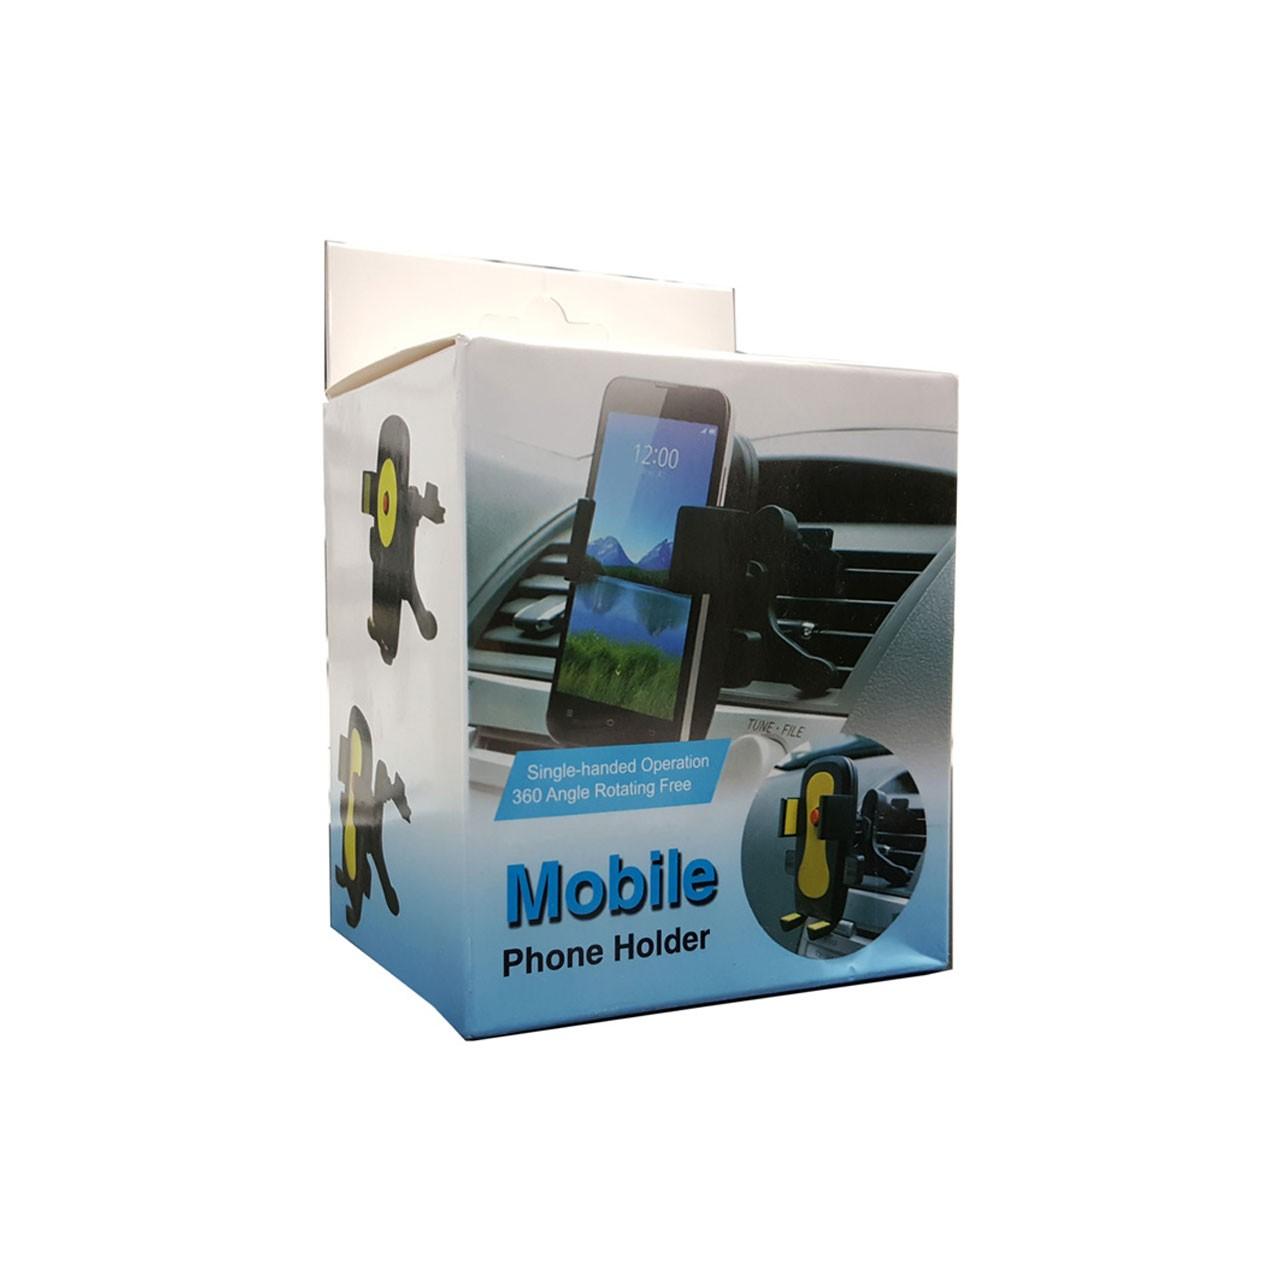 هولدر موبایل ضامن دار (Mobile Holder)